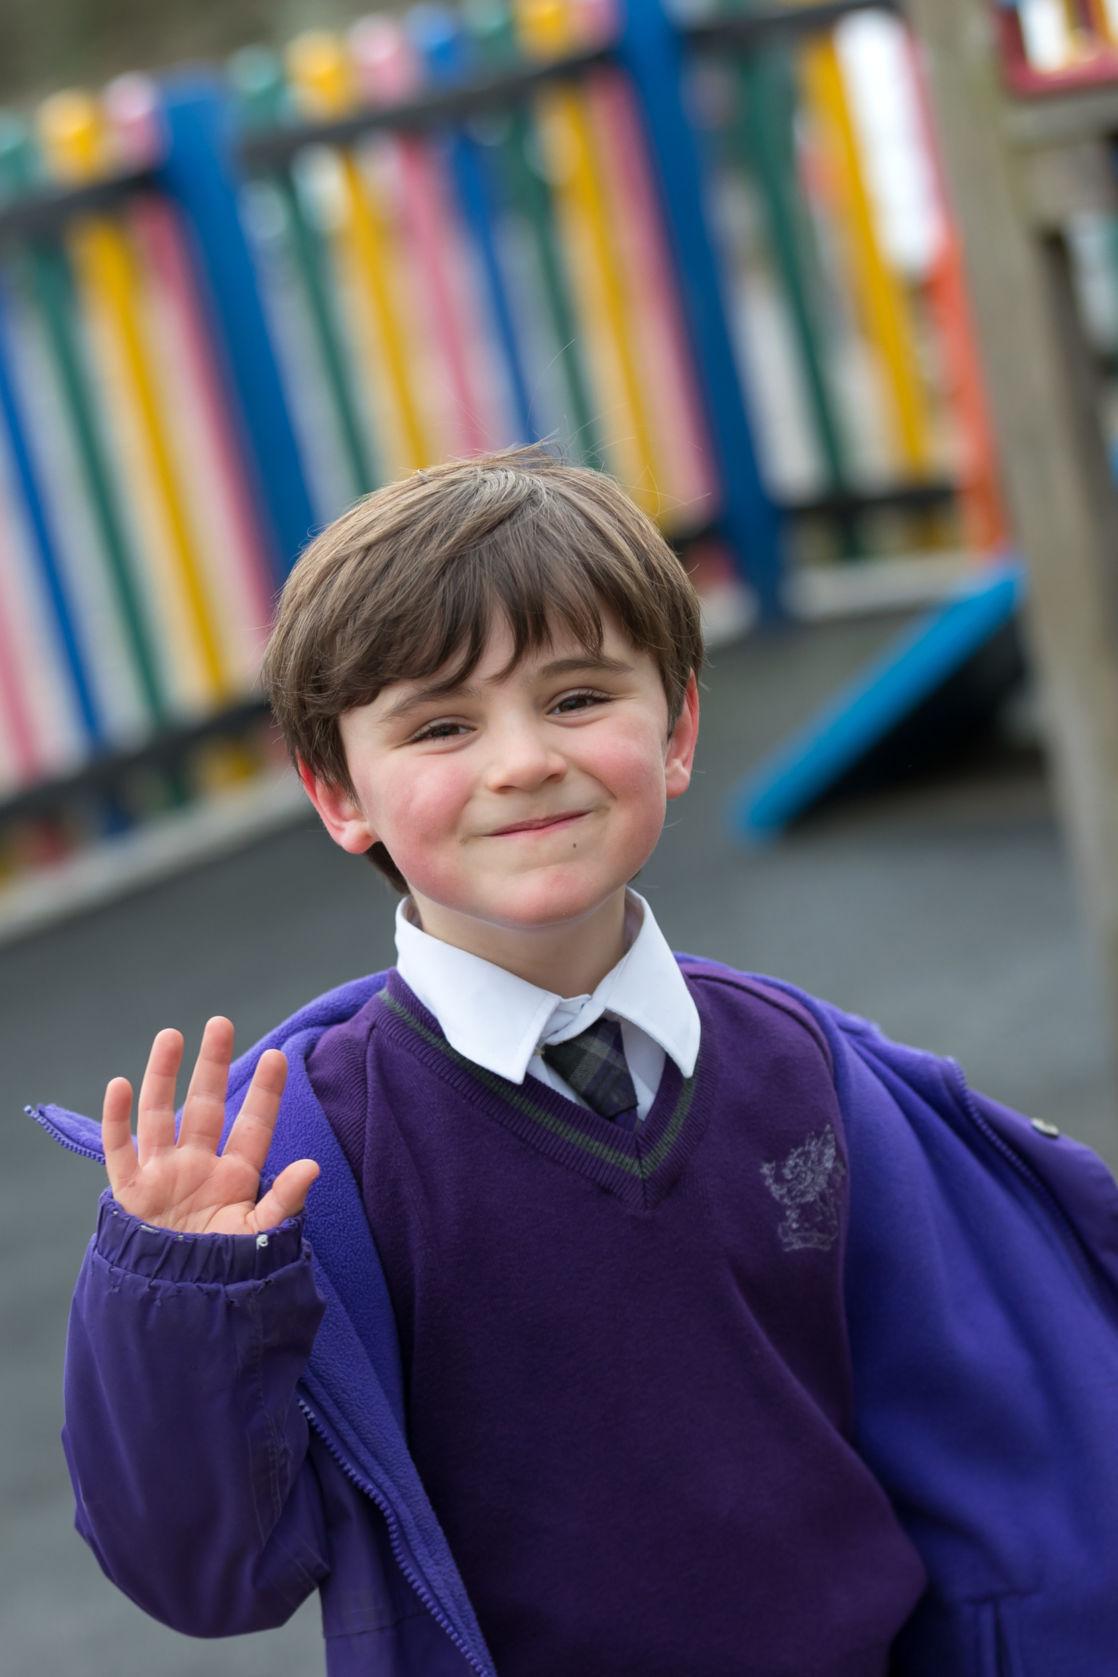 wycliffe nursery boy smiling in the playground